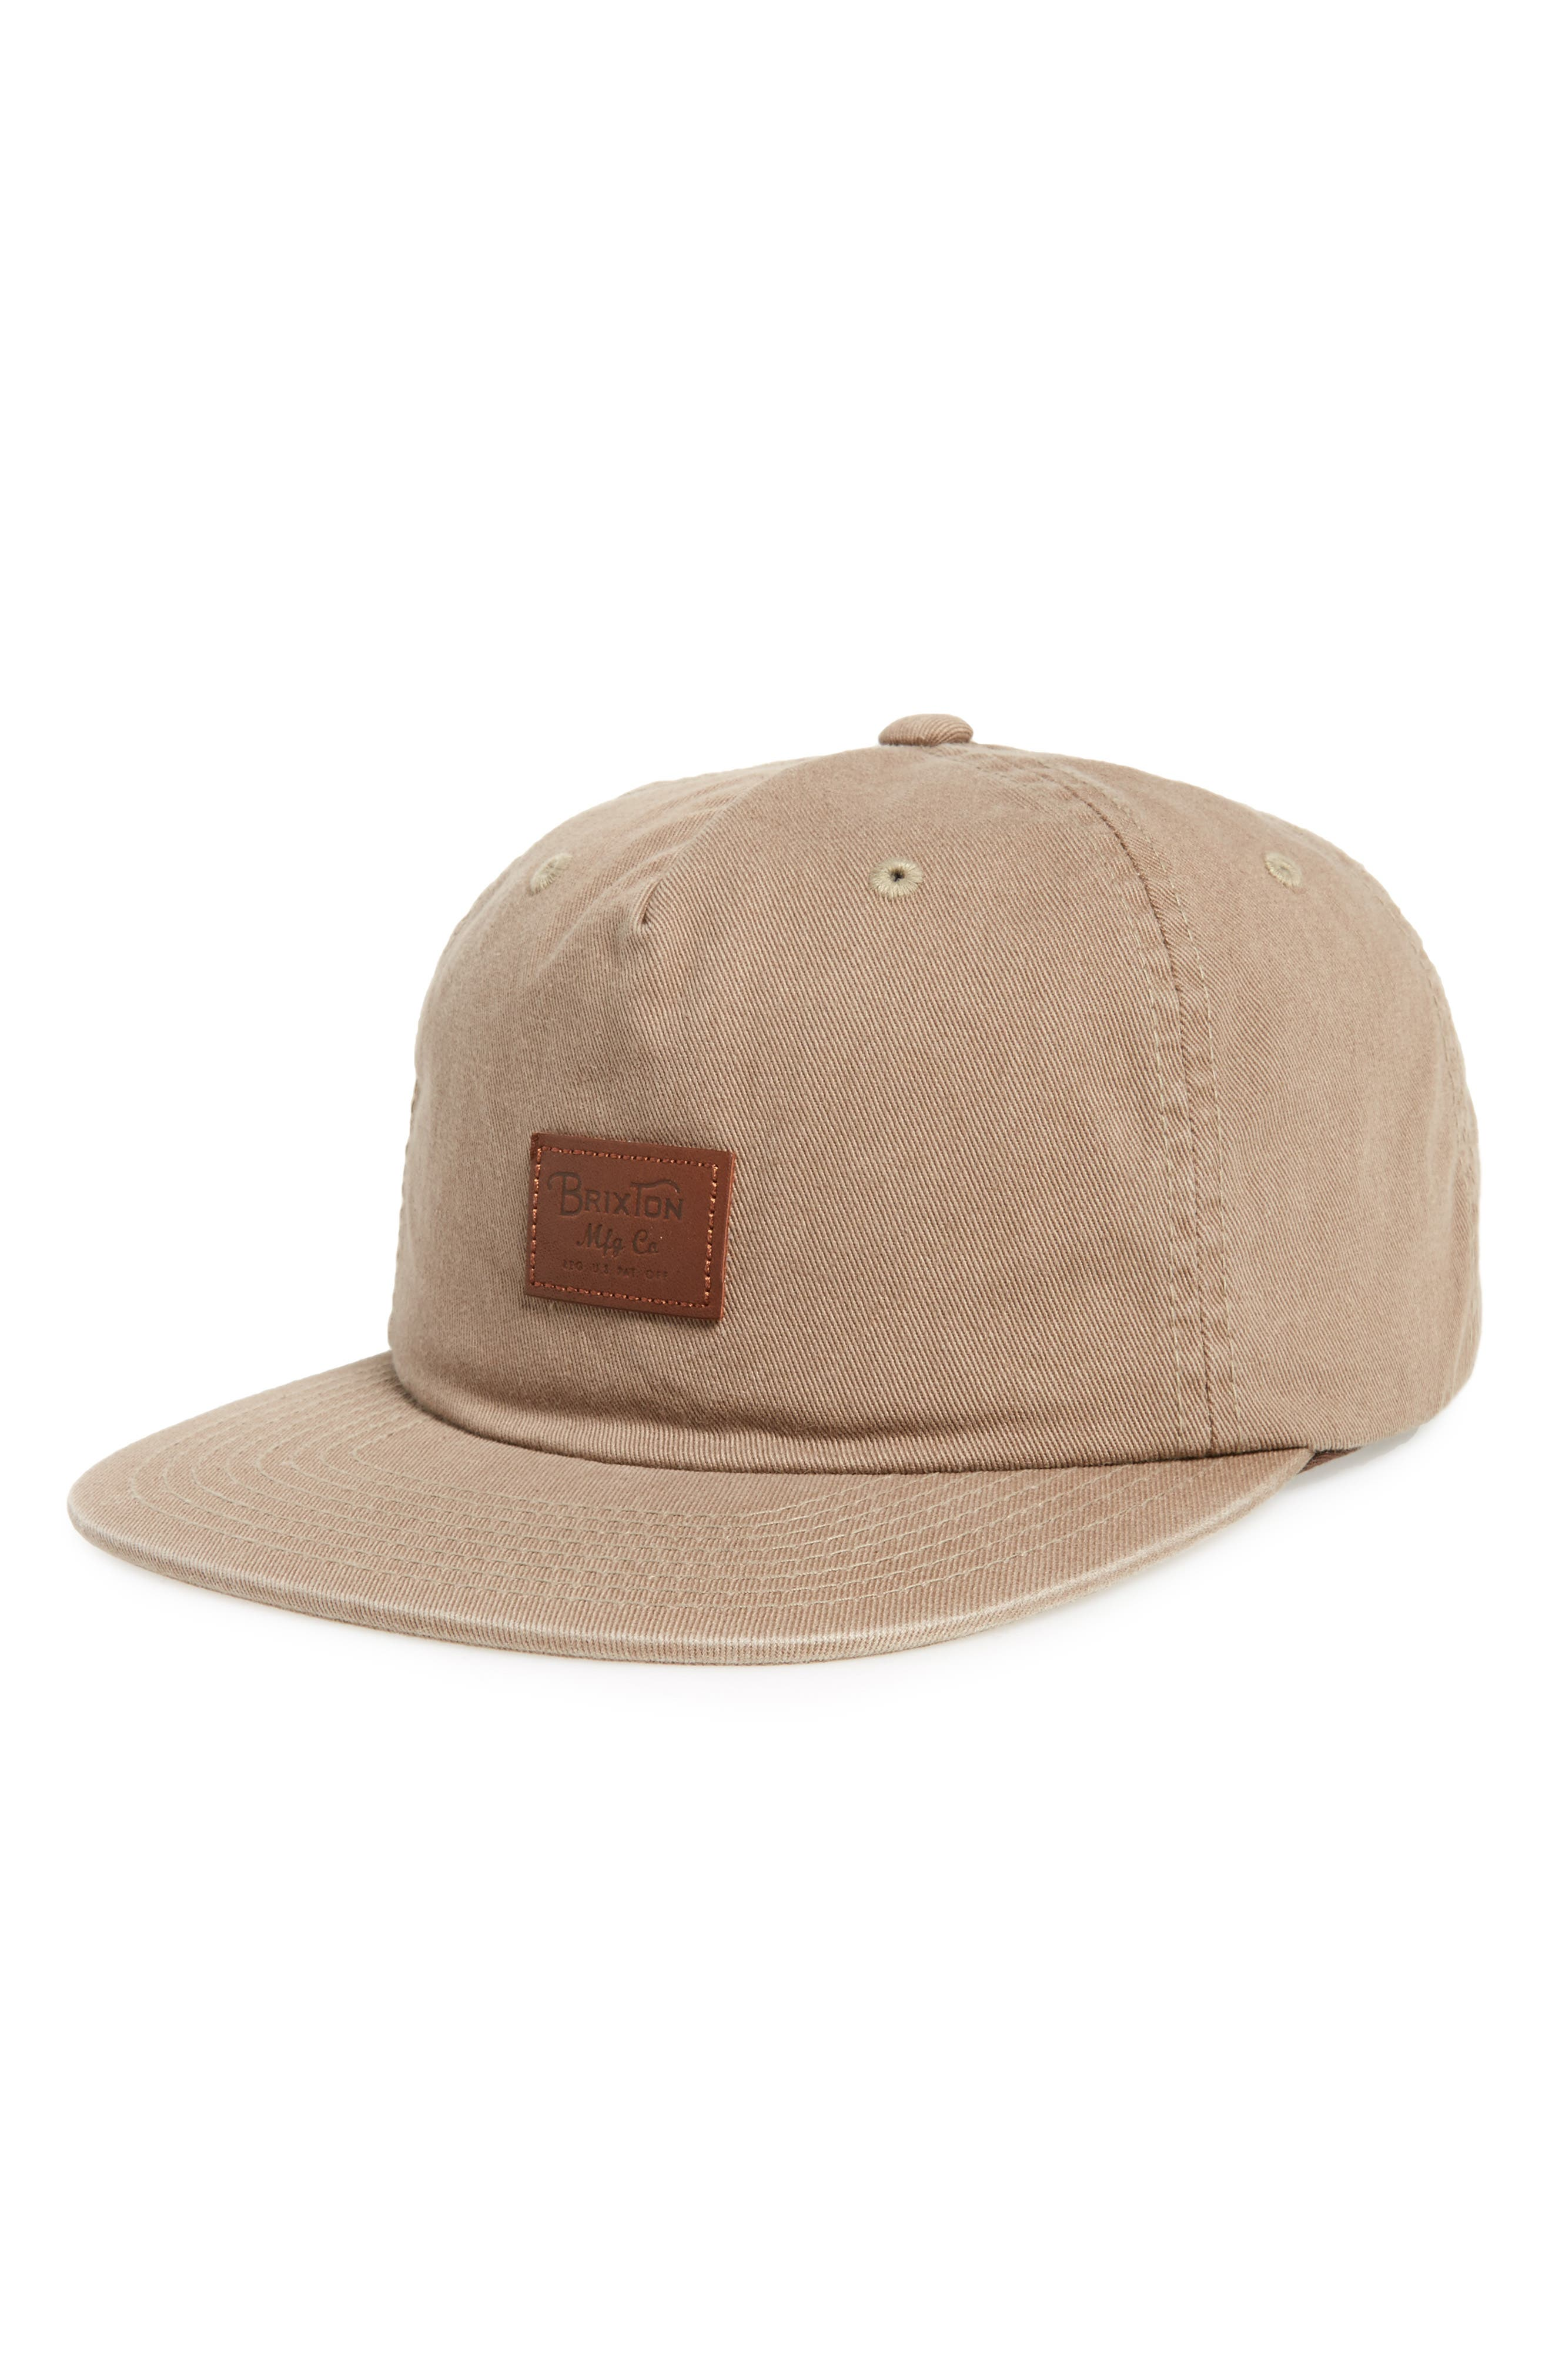 BRIXTON Grade II Snapback Baseball Cap